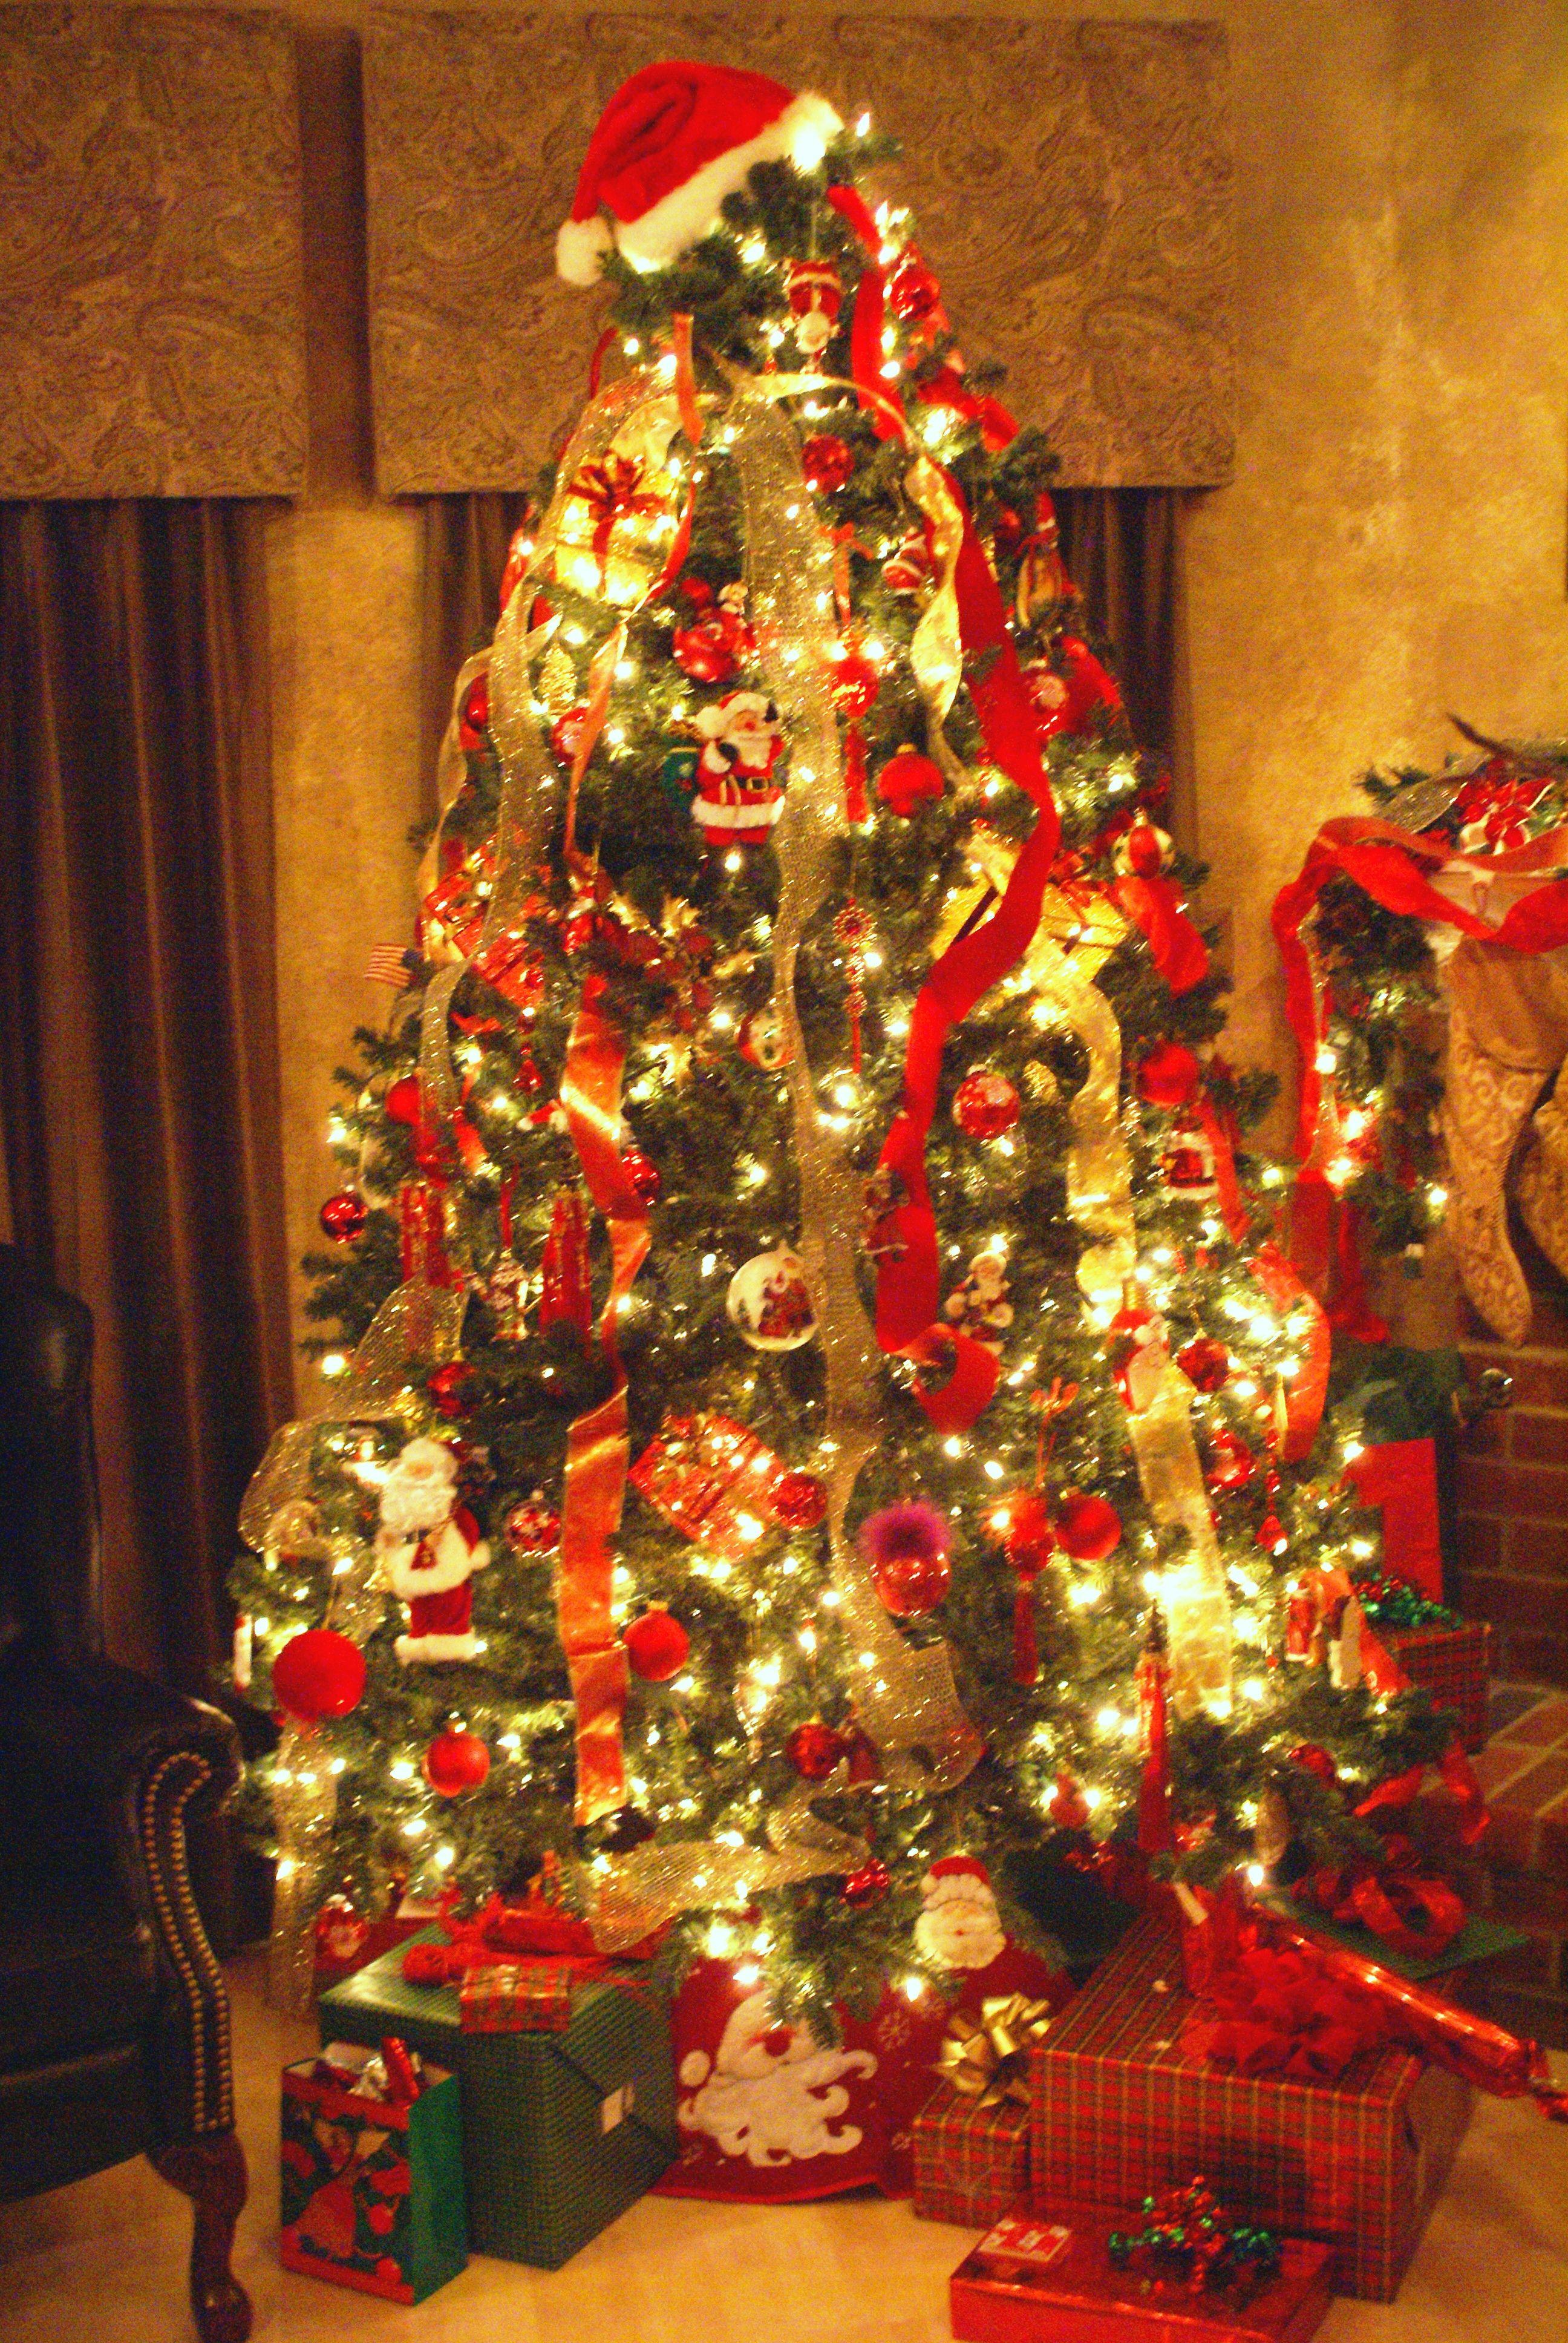 vertical ribbon draping with Santa hat as tree topper